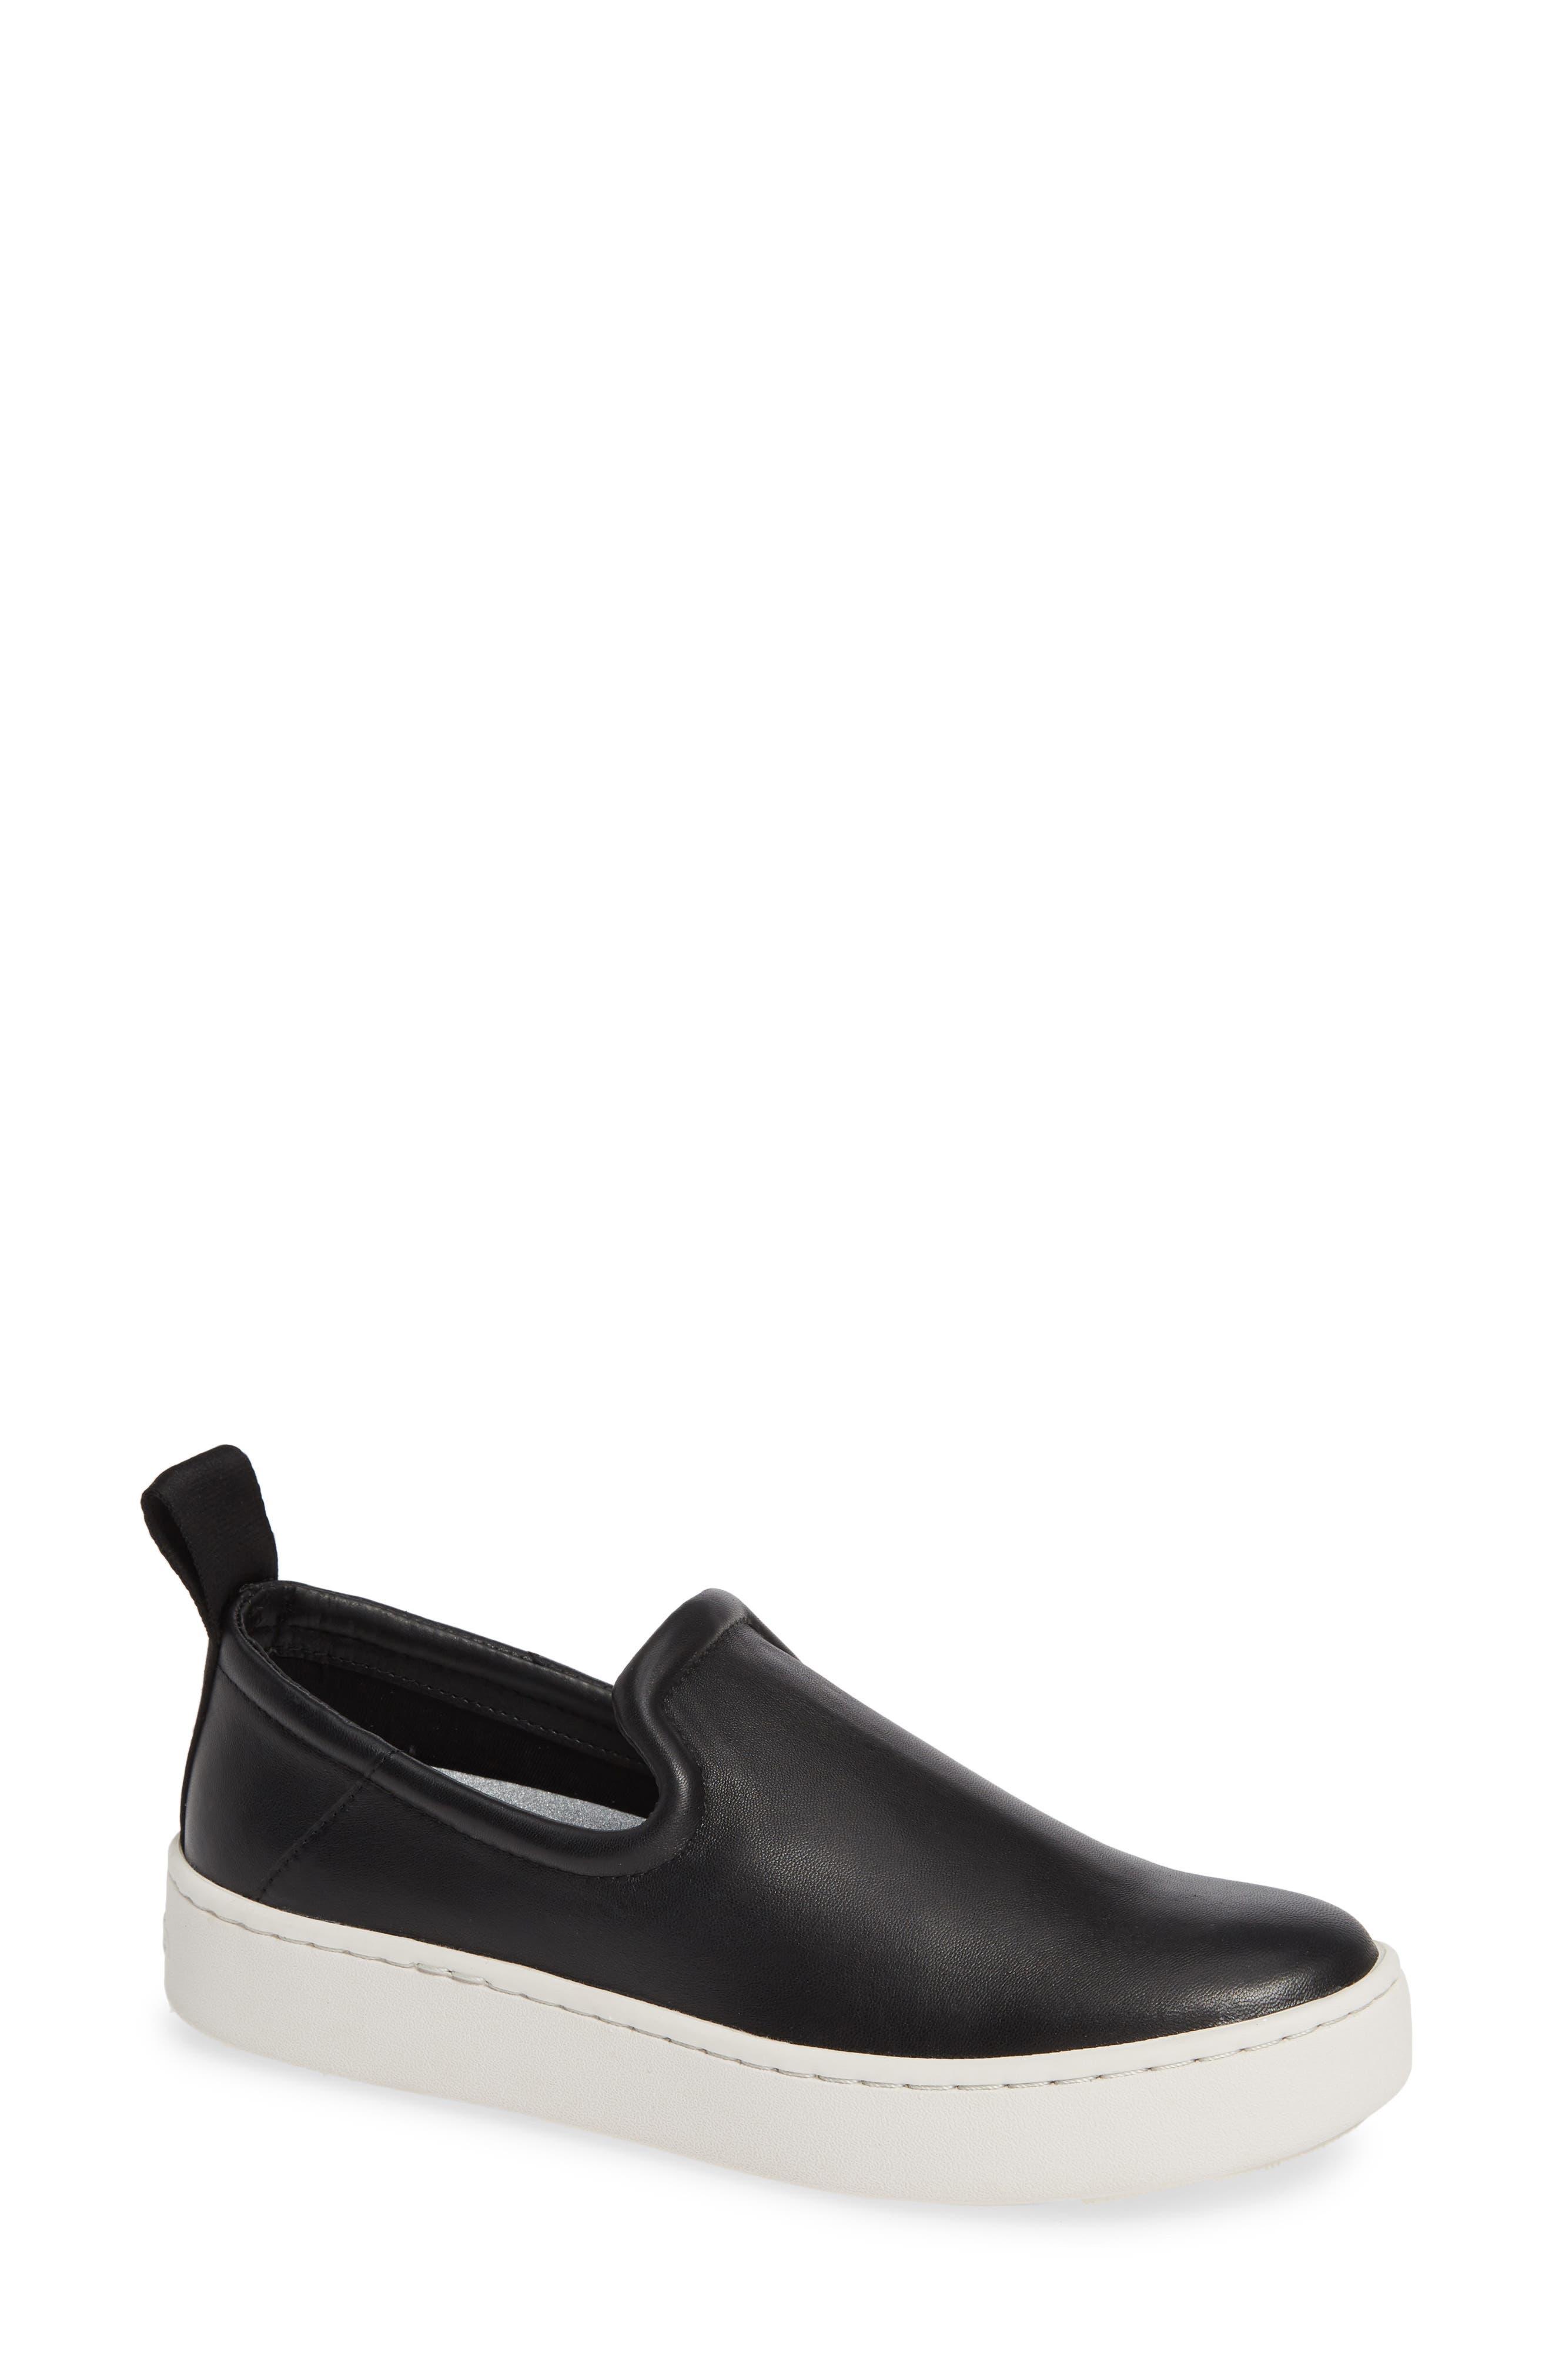 DOLCE VITA, Tag Slip-On Sneaker, Main thumbnail 1, color, BLACK LEATHER